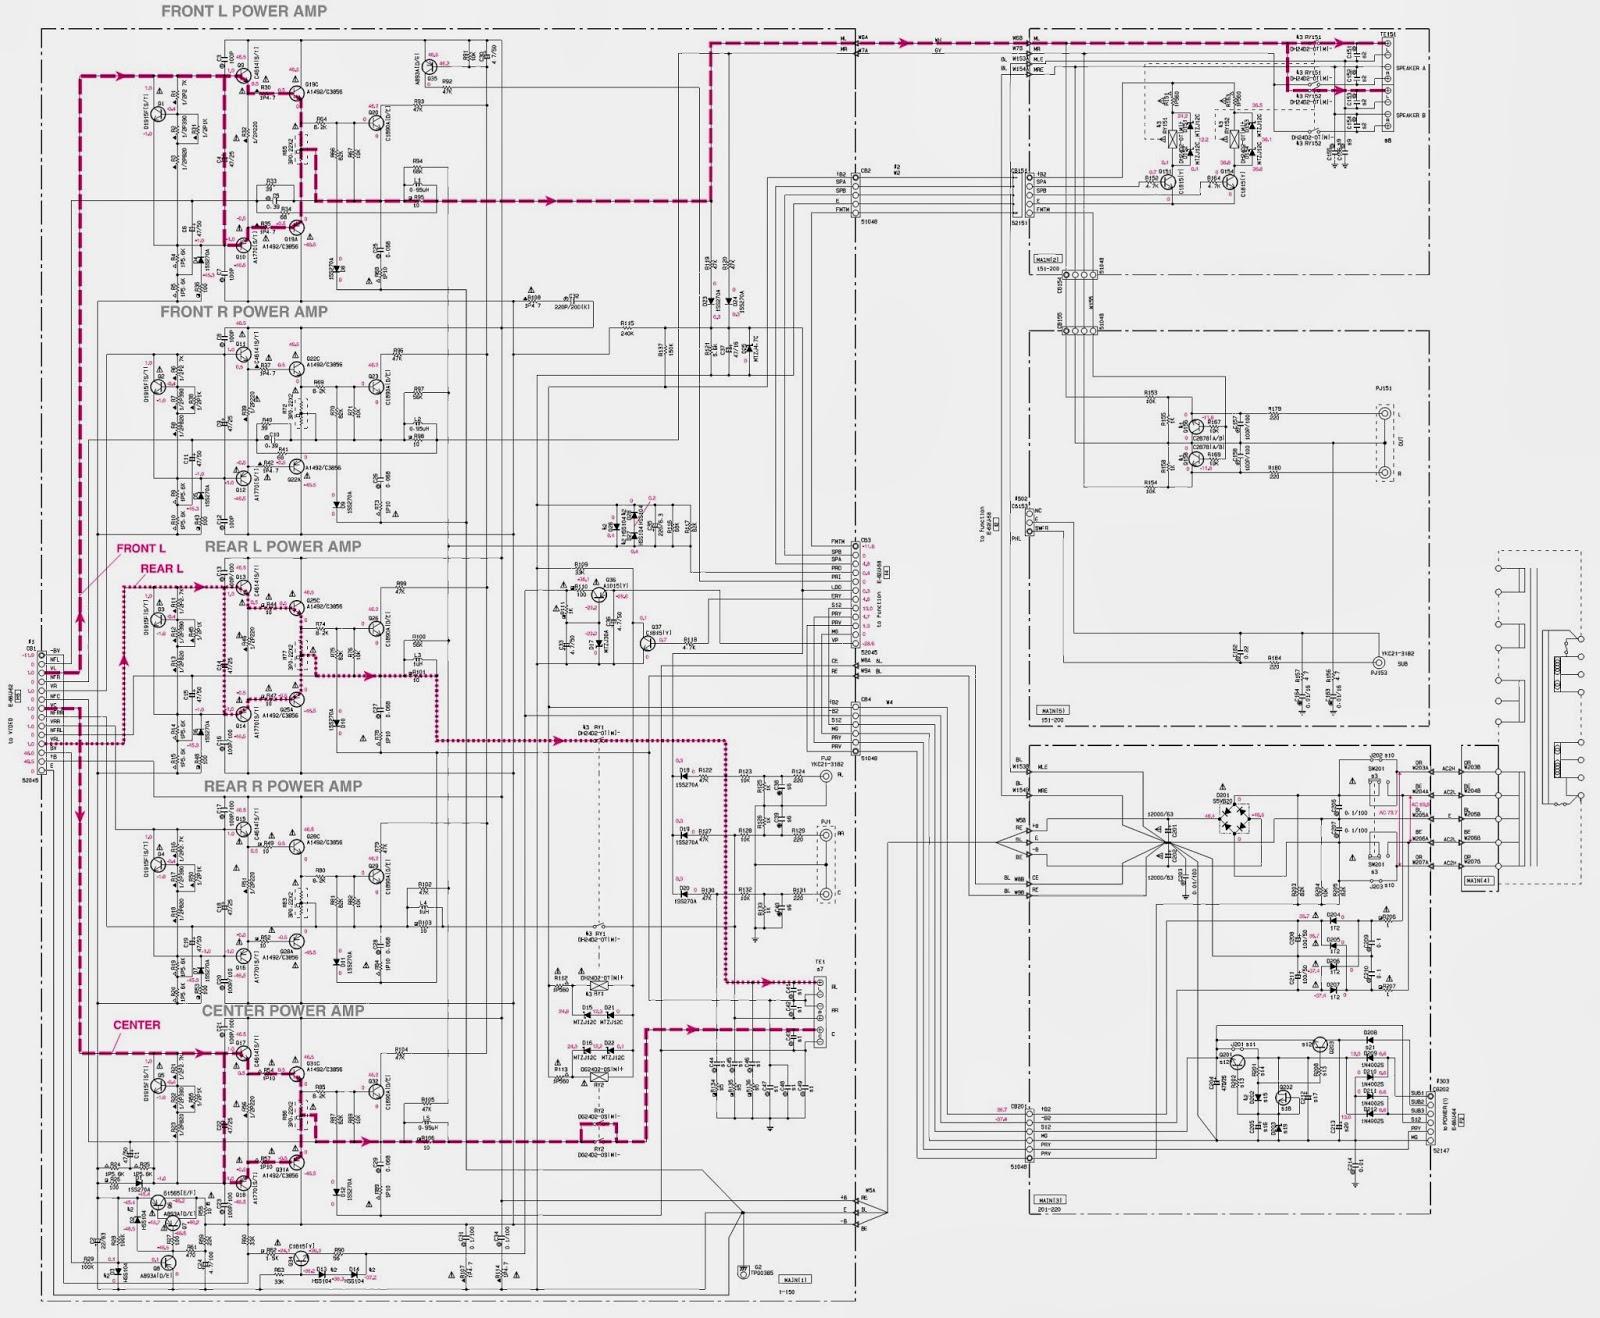 yamaha rx v800 rx v800rds htr 5280 u2013 av receiver power amp schematicamp schematic circuit diagram [ 1600 x 1318 Pixel ]